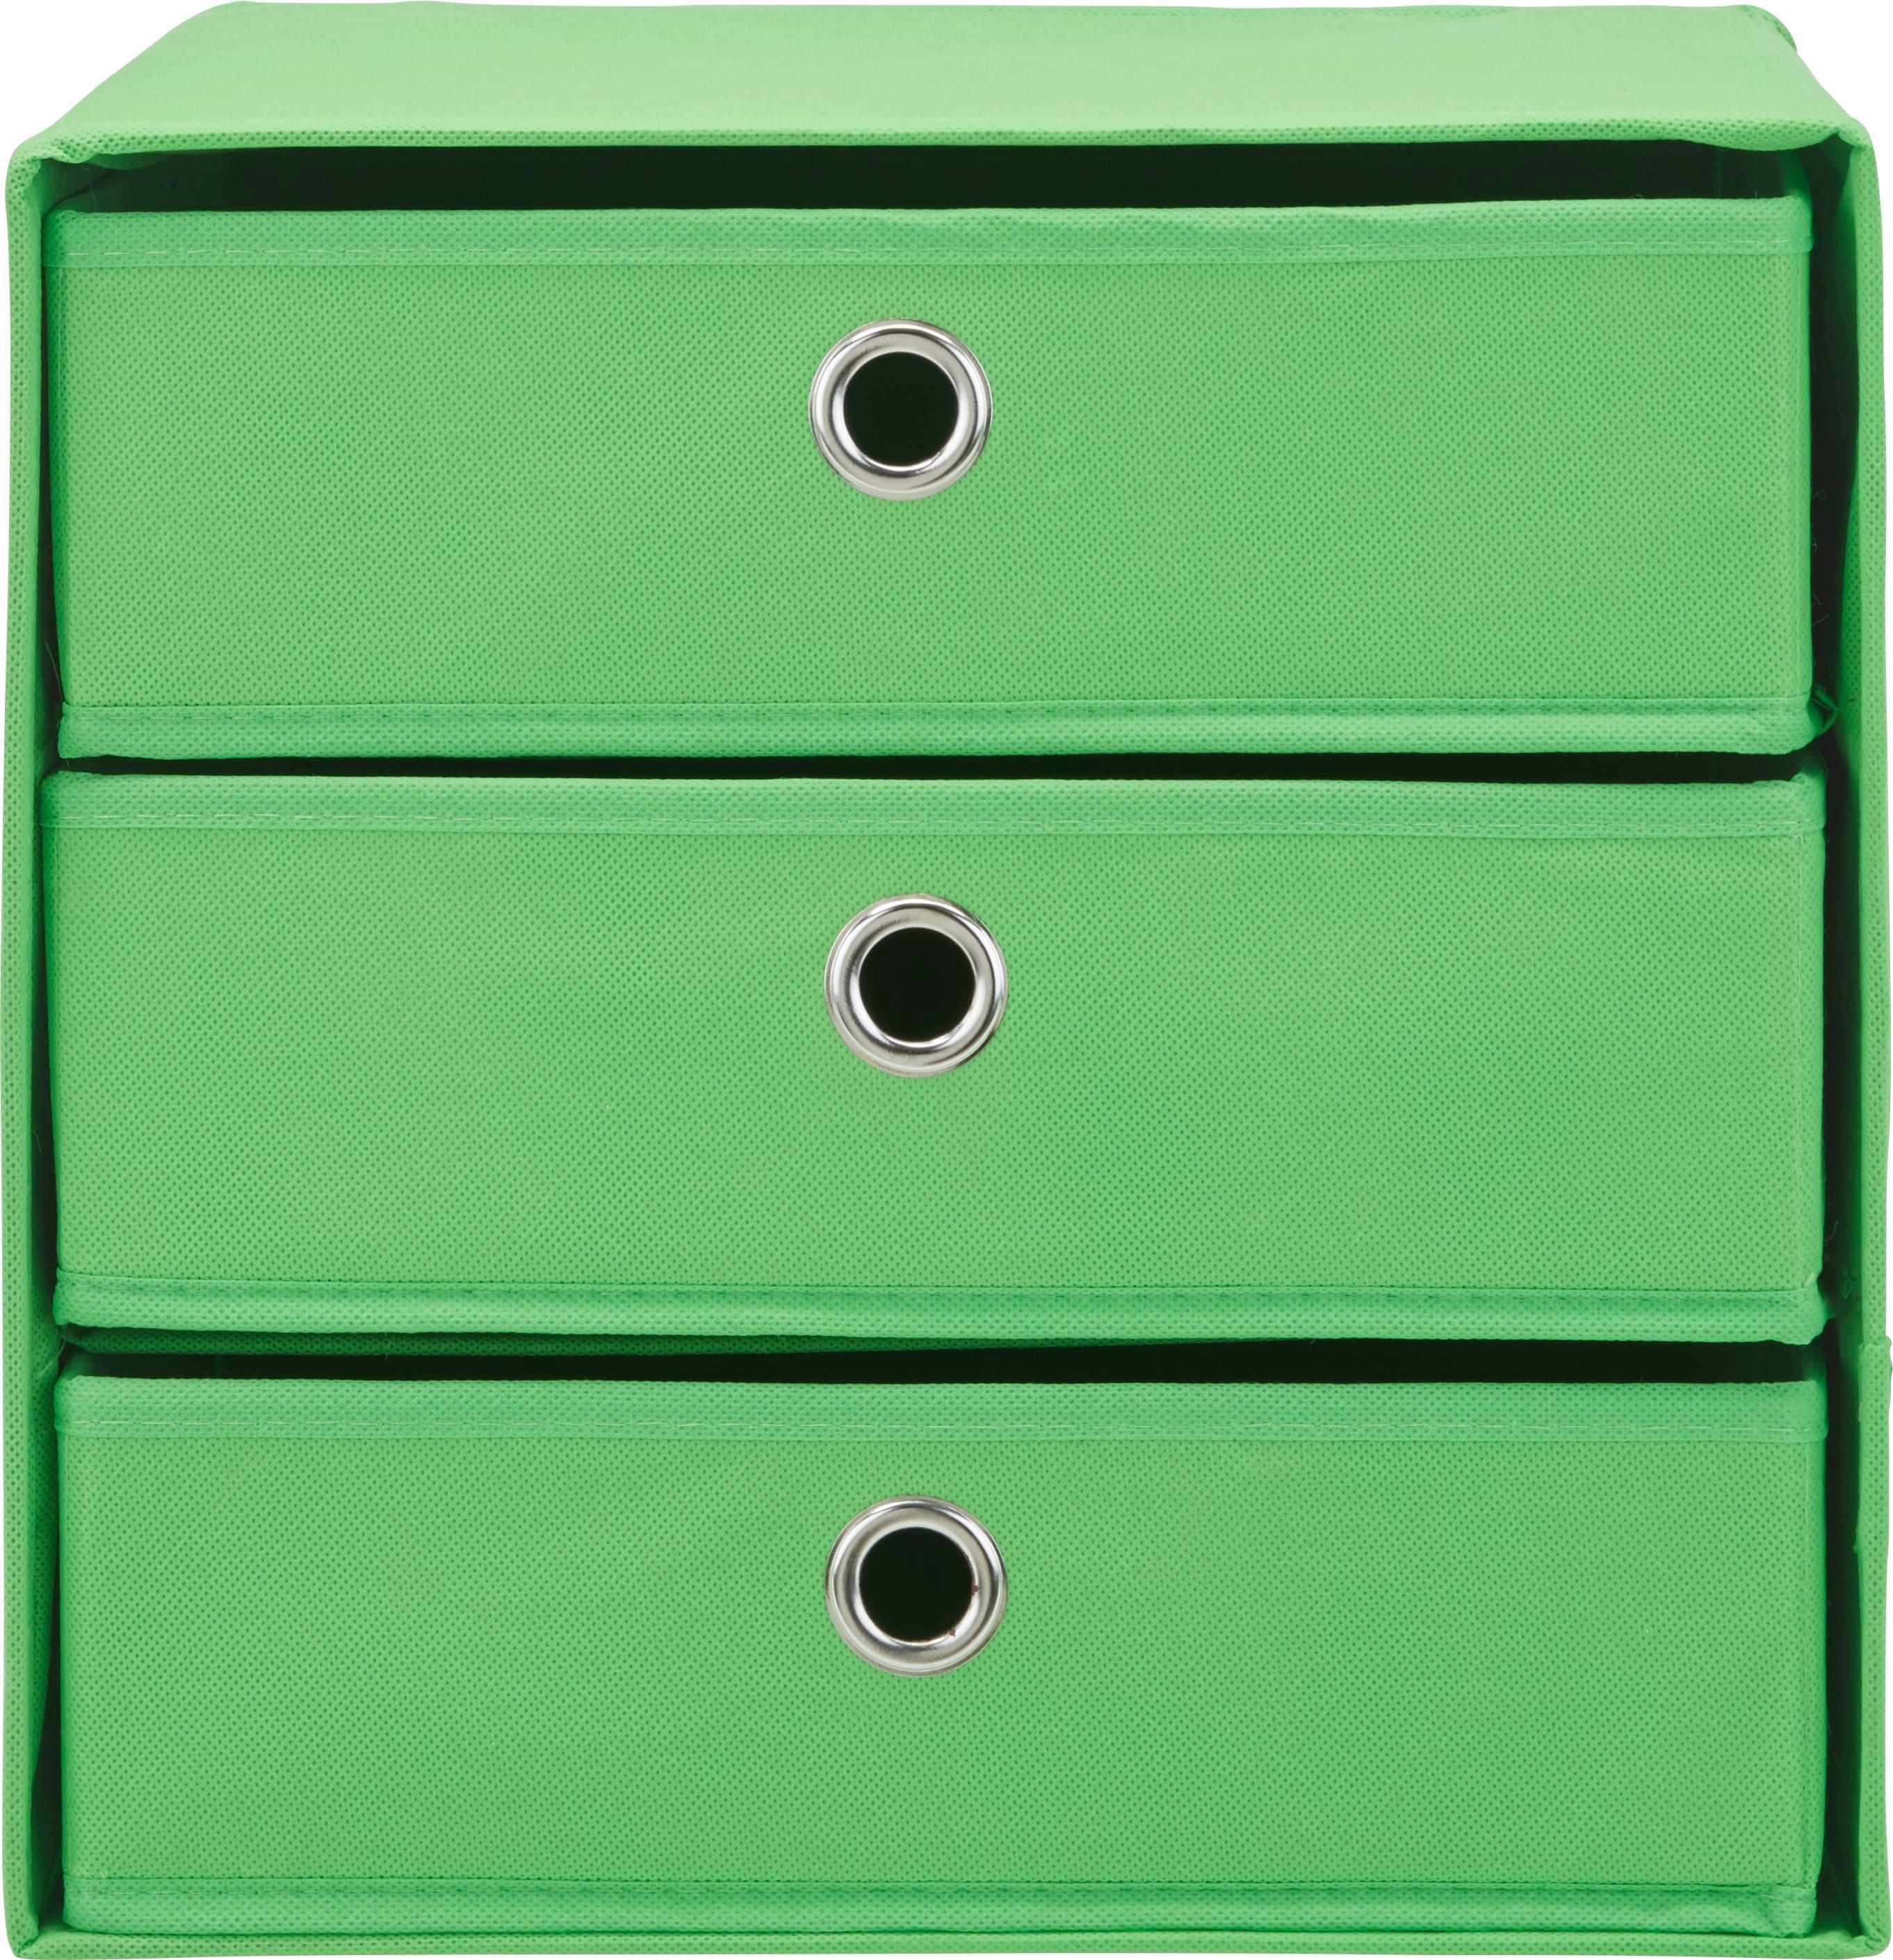 Schubladenbox Mona in Grün ca. 32x31,5cm - Grün, MODERN, Karton/Textil (32/31,5/32cm) - MÖMAX modern living